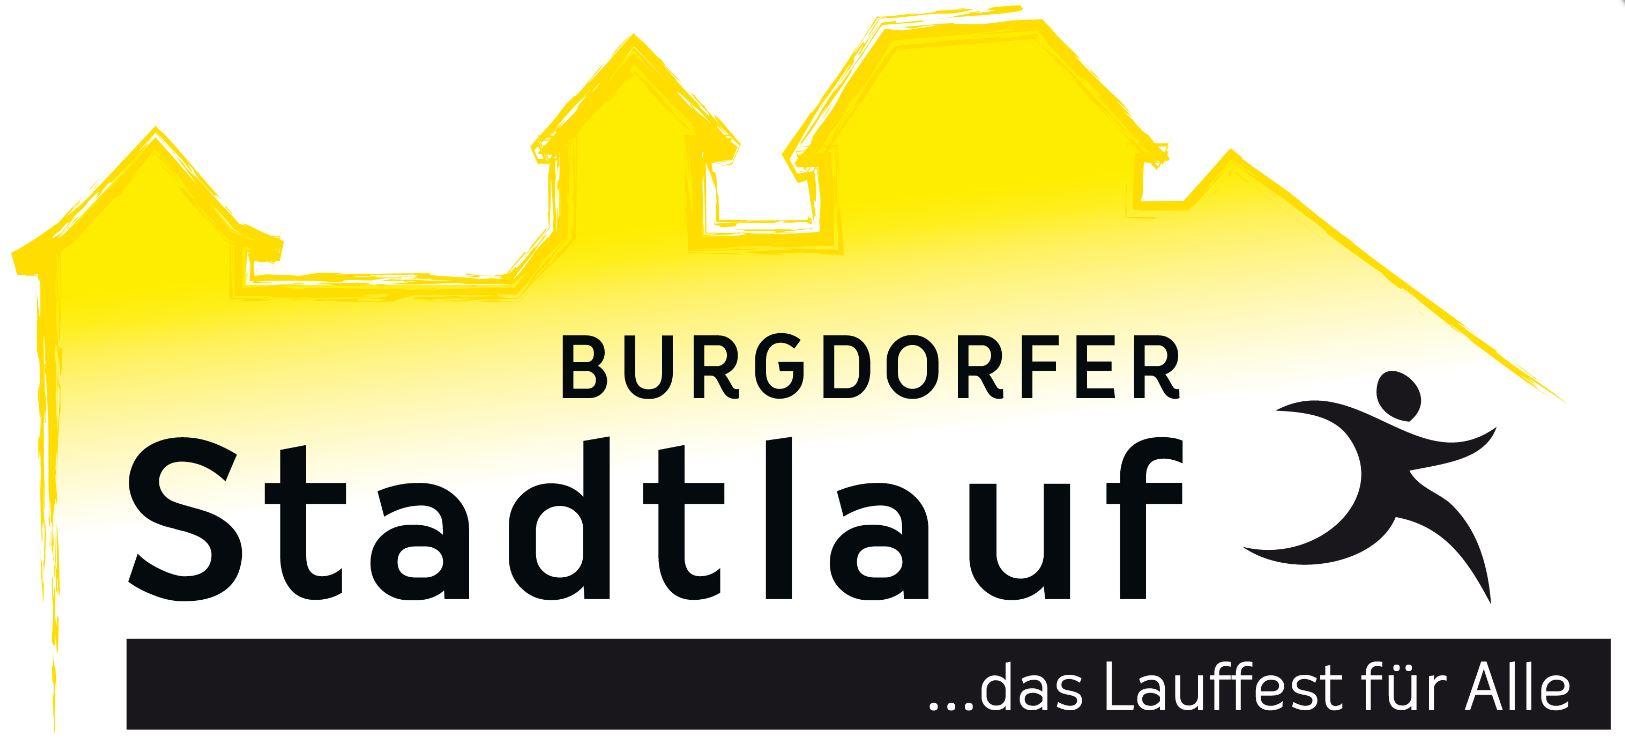 Burgdorfer Stadtlauf 2019 – Super Resultate